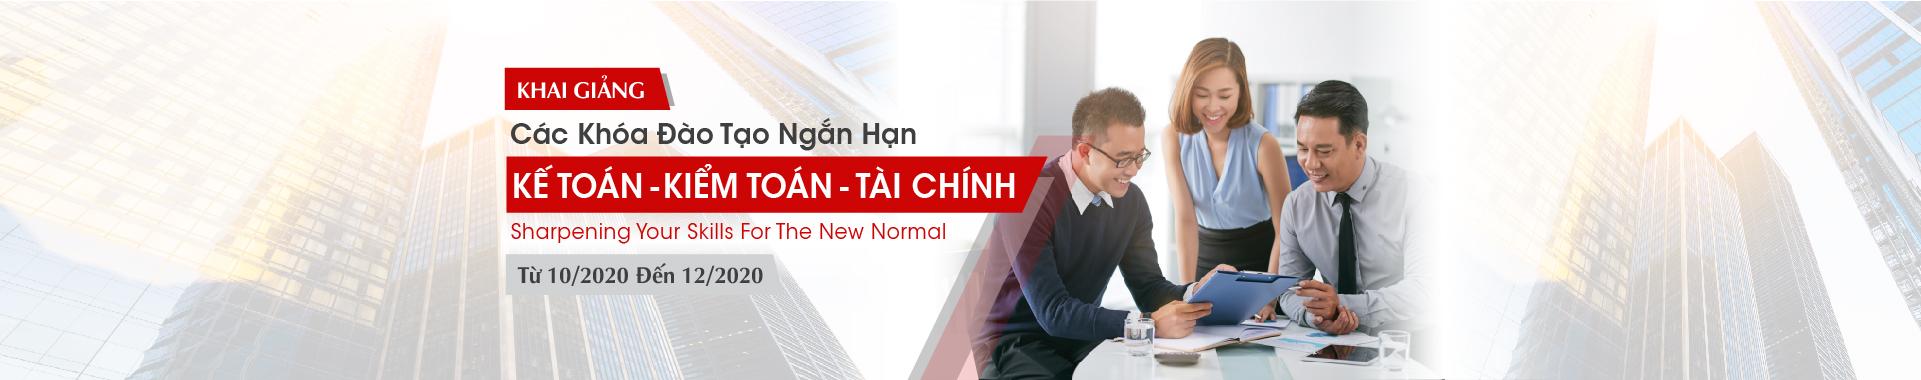 Dao tao KT TC KT cho Doanh nghiep_Banner web